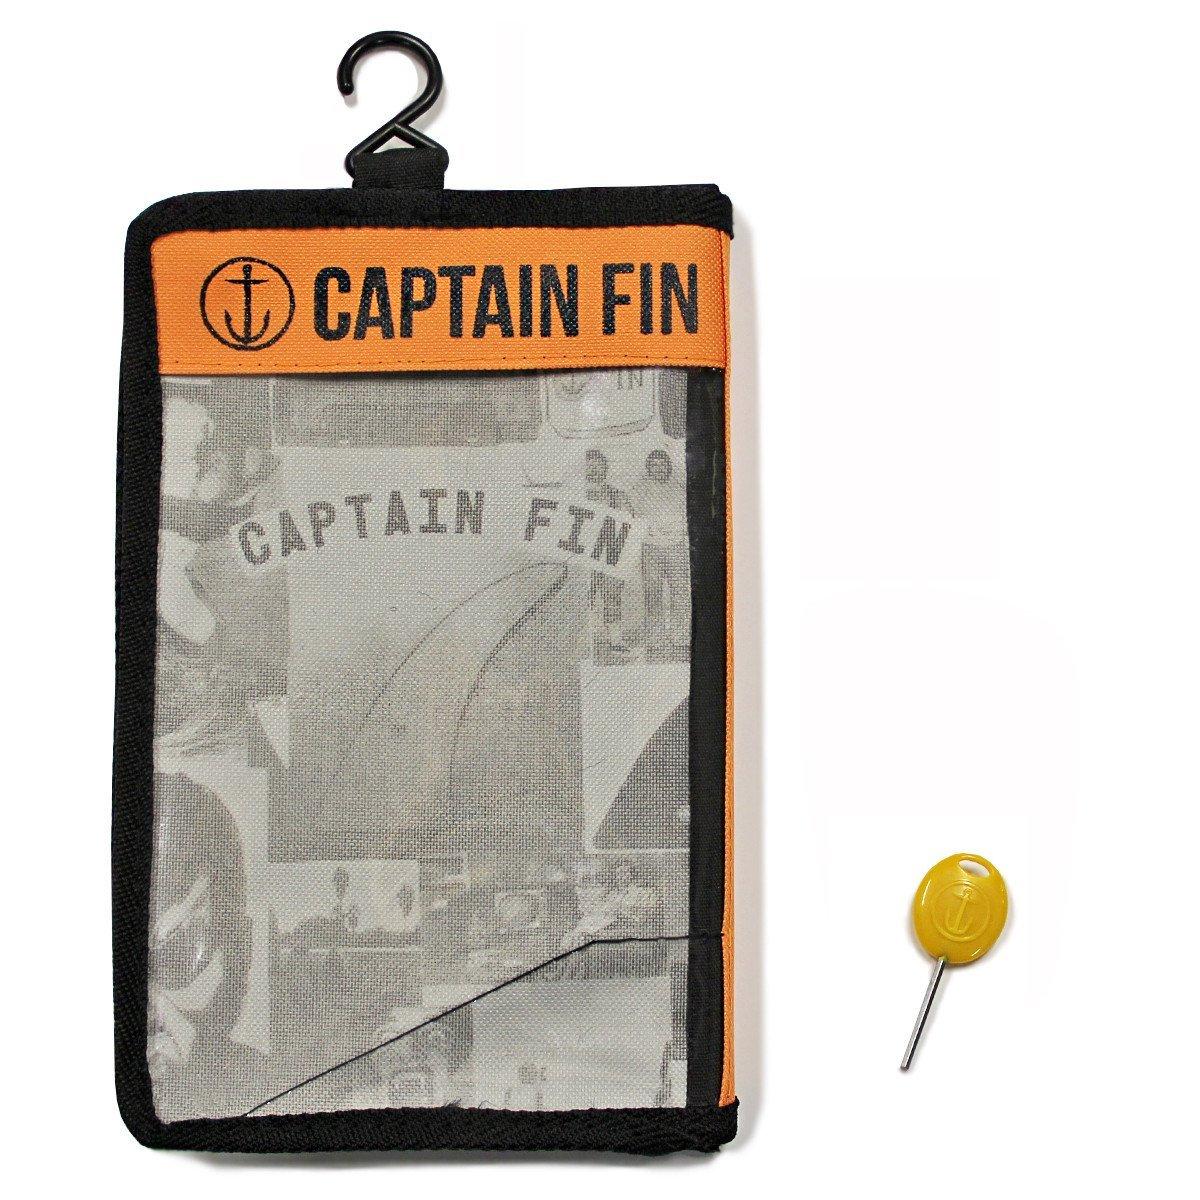 Single Tab Jeff McCallum Quad Especial Surfboard Fins Captain Fin Co 4 Fin Set Black